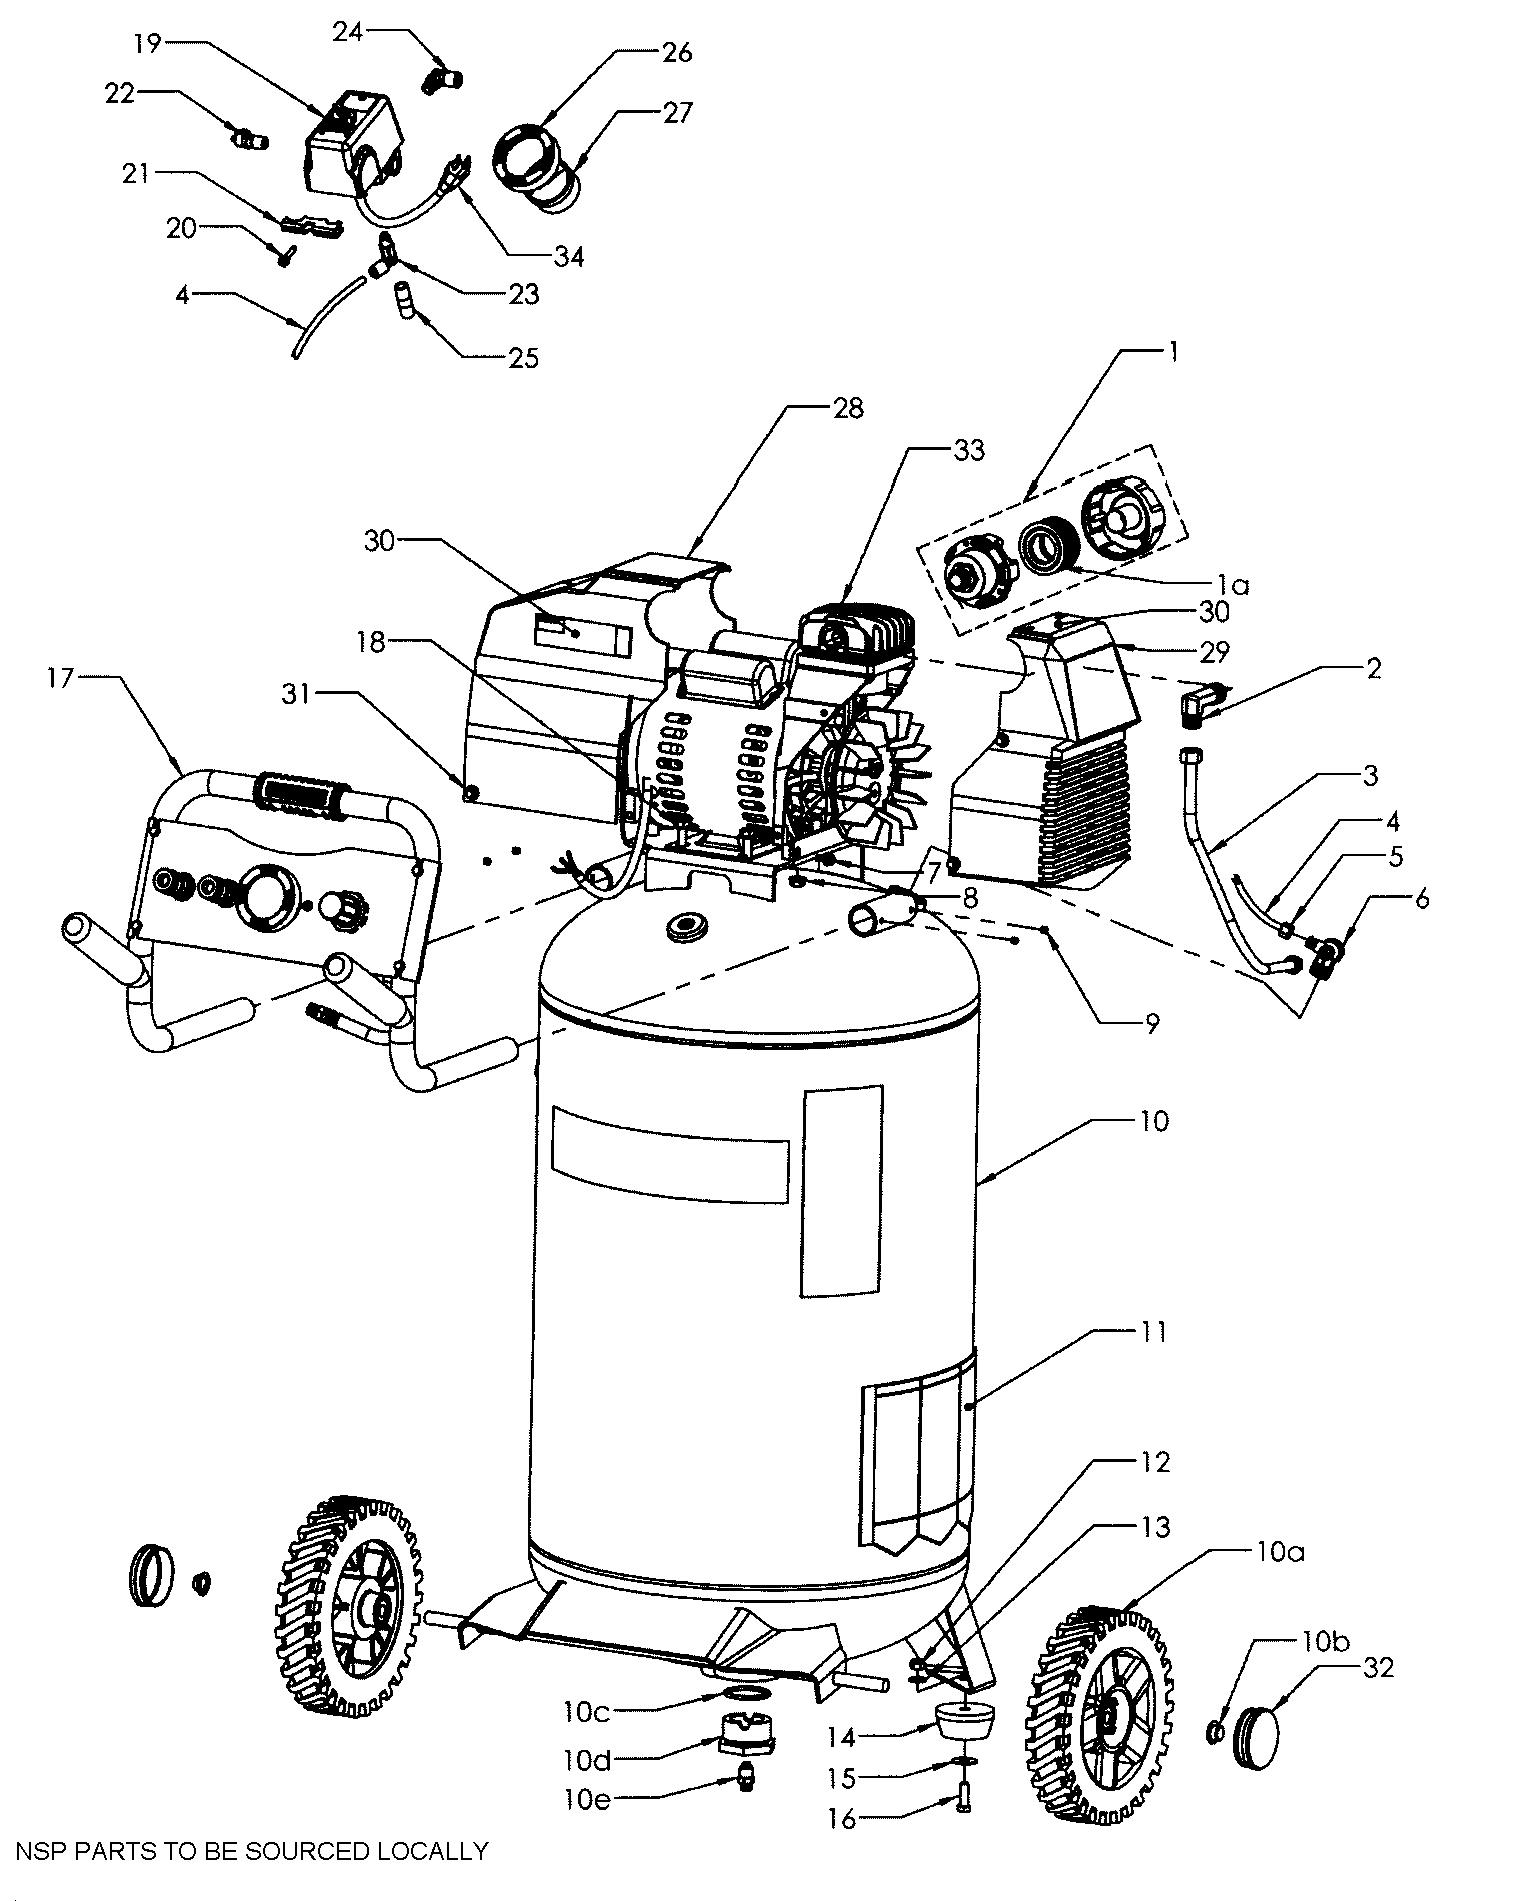 Craftsman model 92116472 air compressor genuine parts